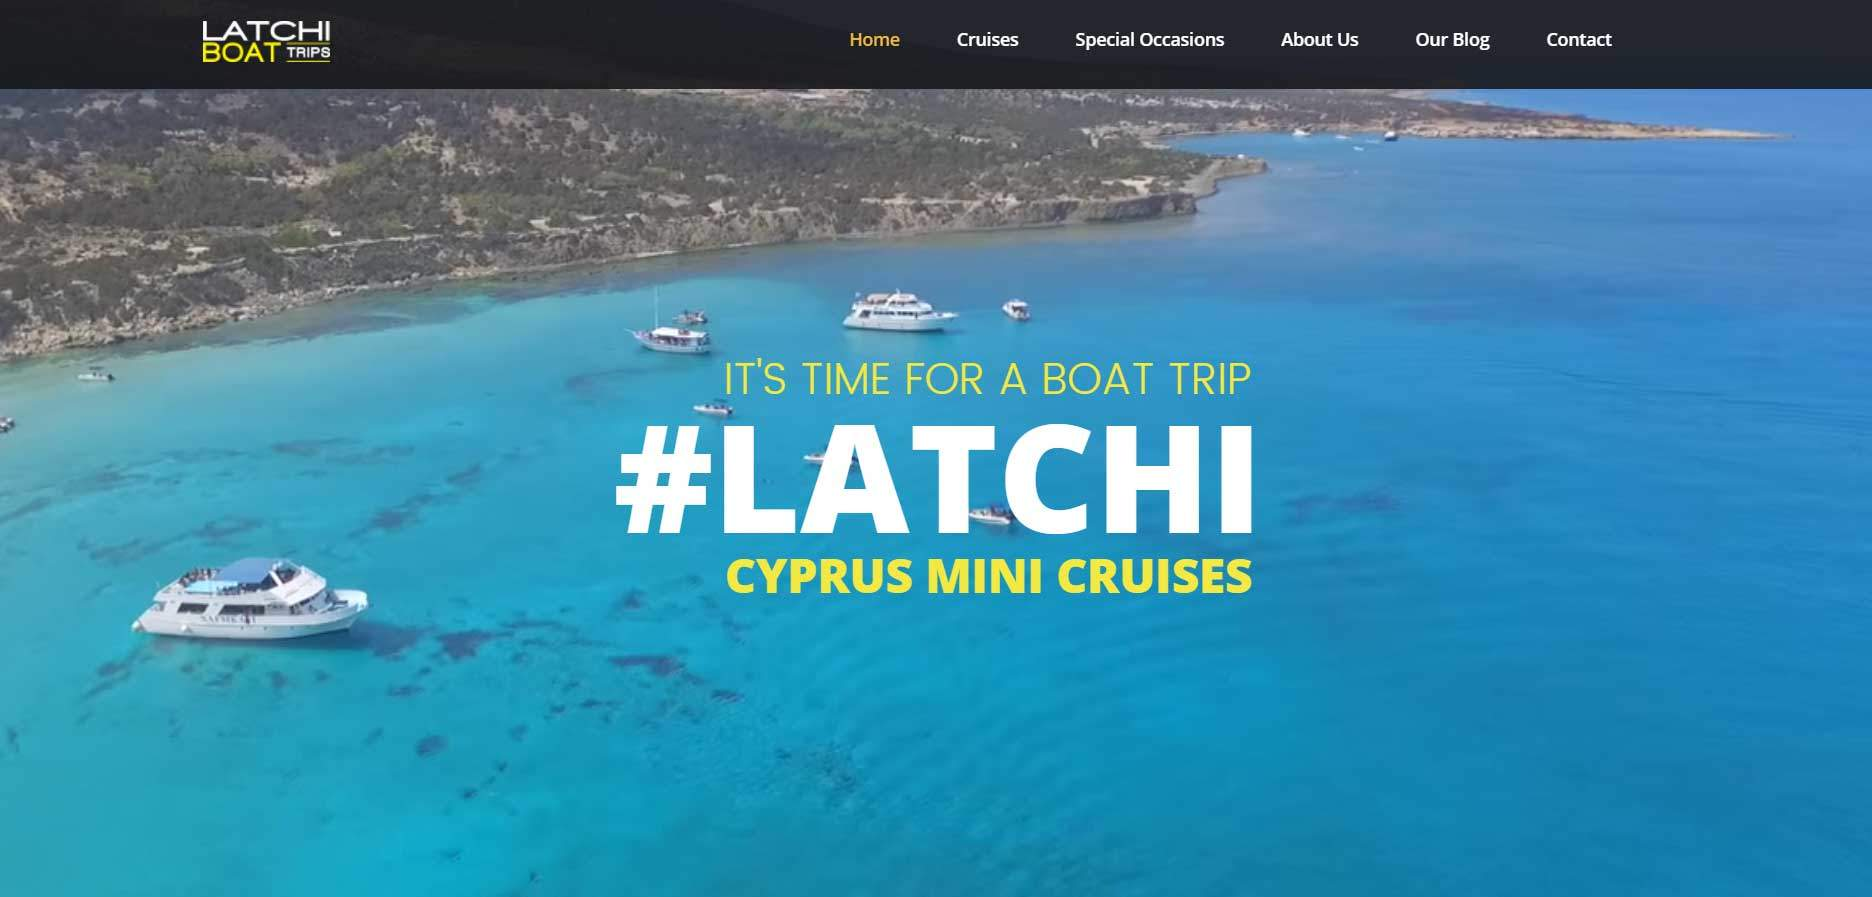 Latchi Boat Trip with Cyprus Mini Cruises, Gecko Design